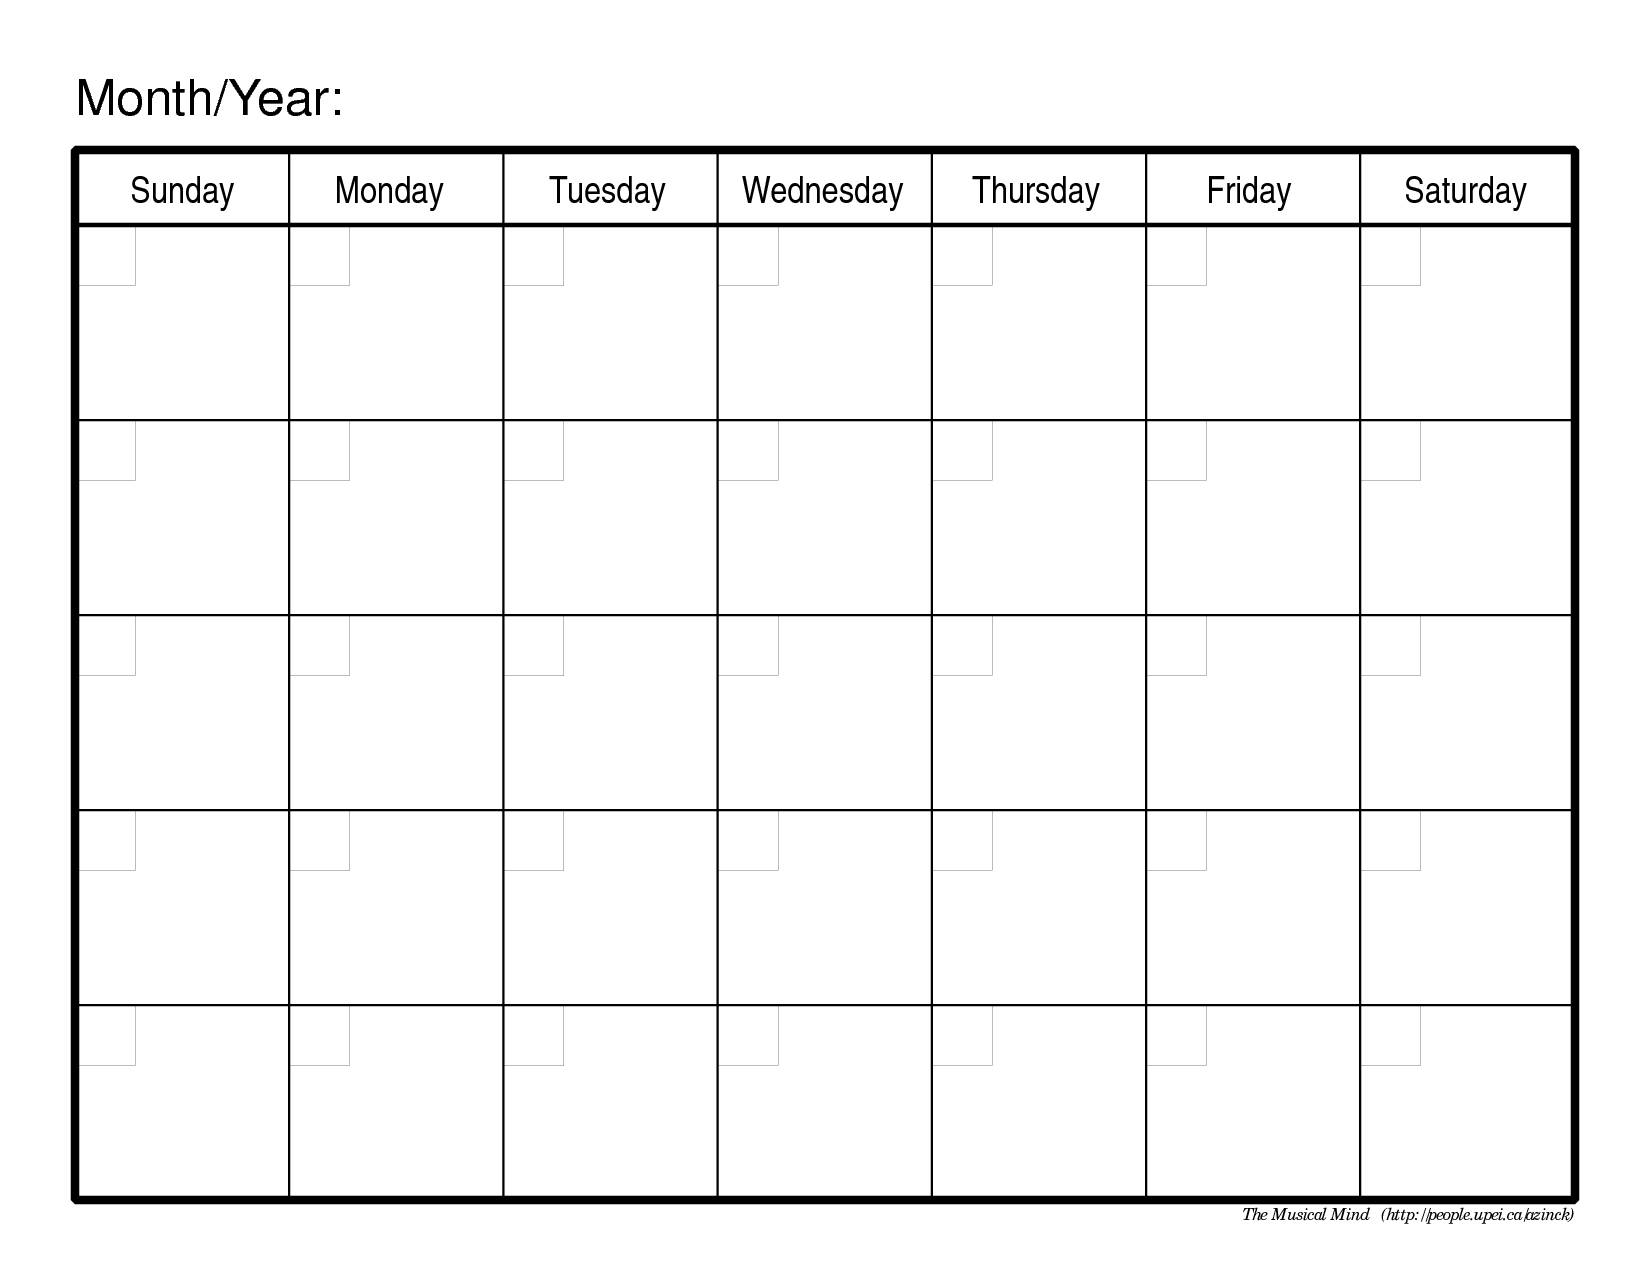 Calendar Monthly Besikeighty3co3abry